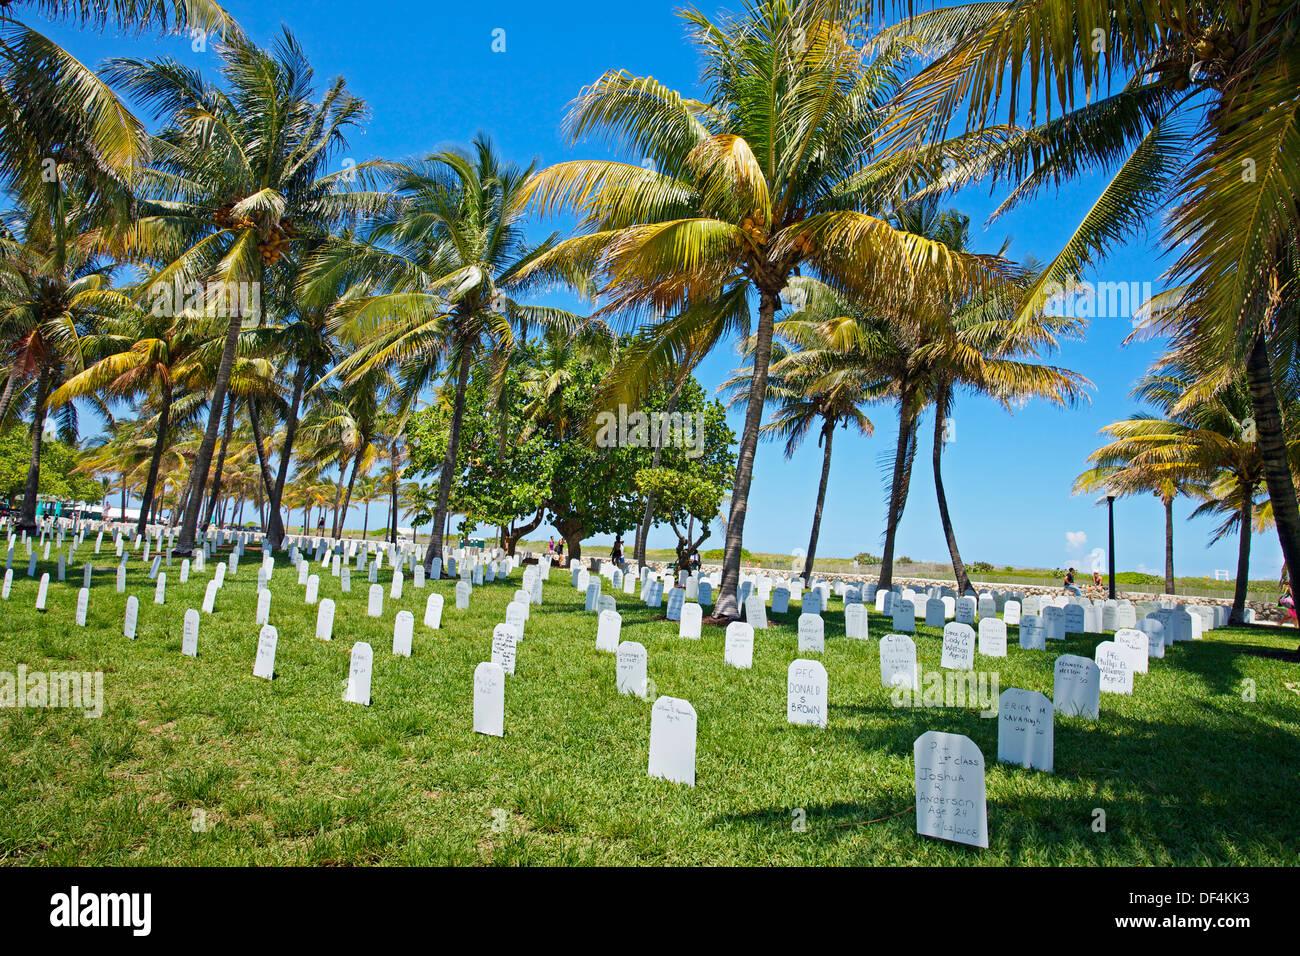 Memorial for Irak war American soldiers dead at Ocean Drive, Memorial Day, South Beach, Art deco district, Miami beach, - Stock Image